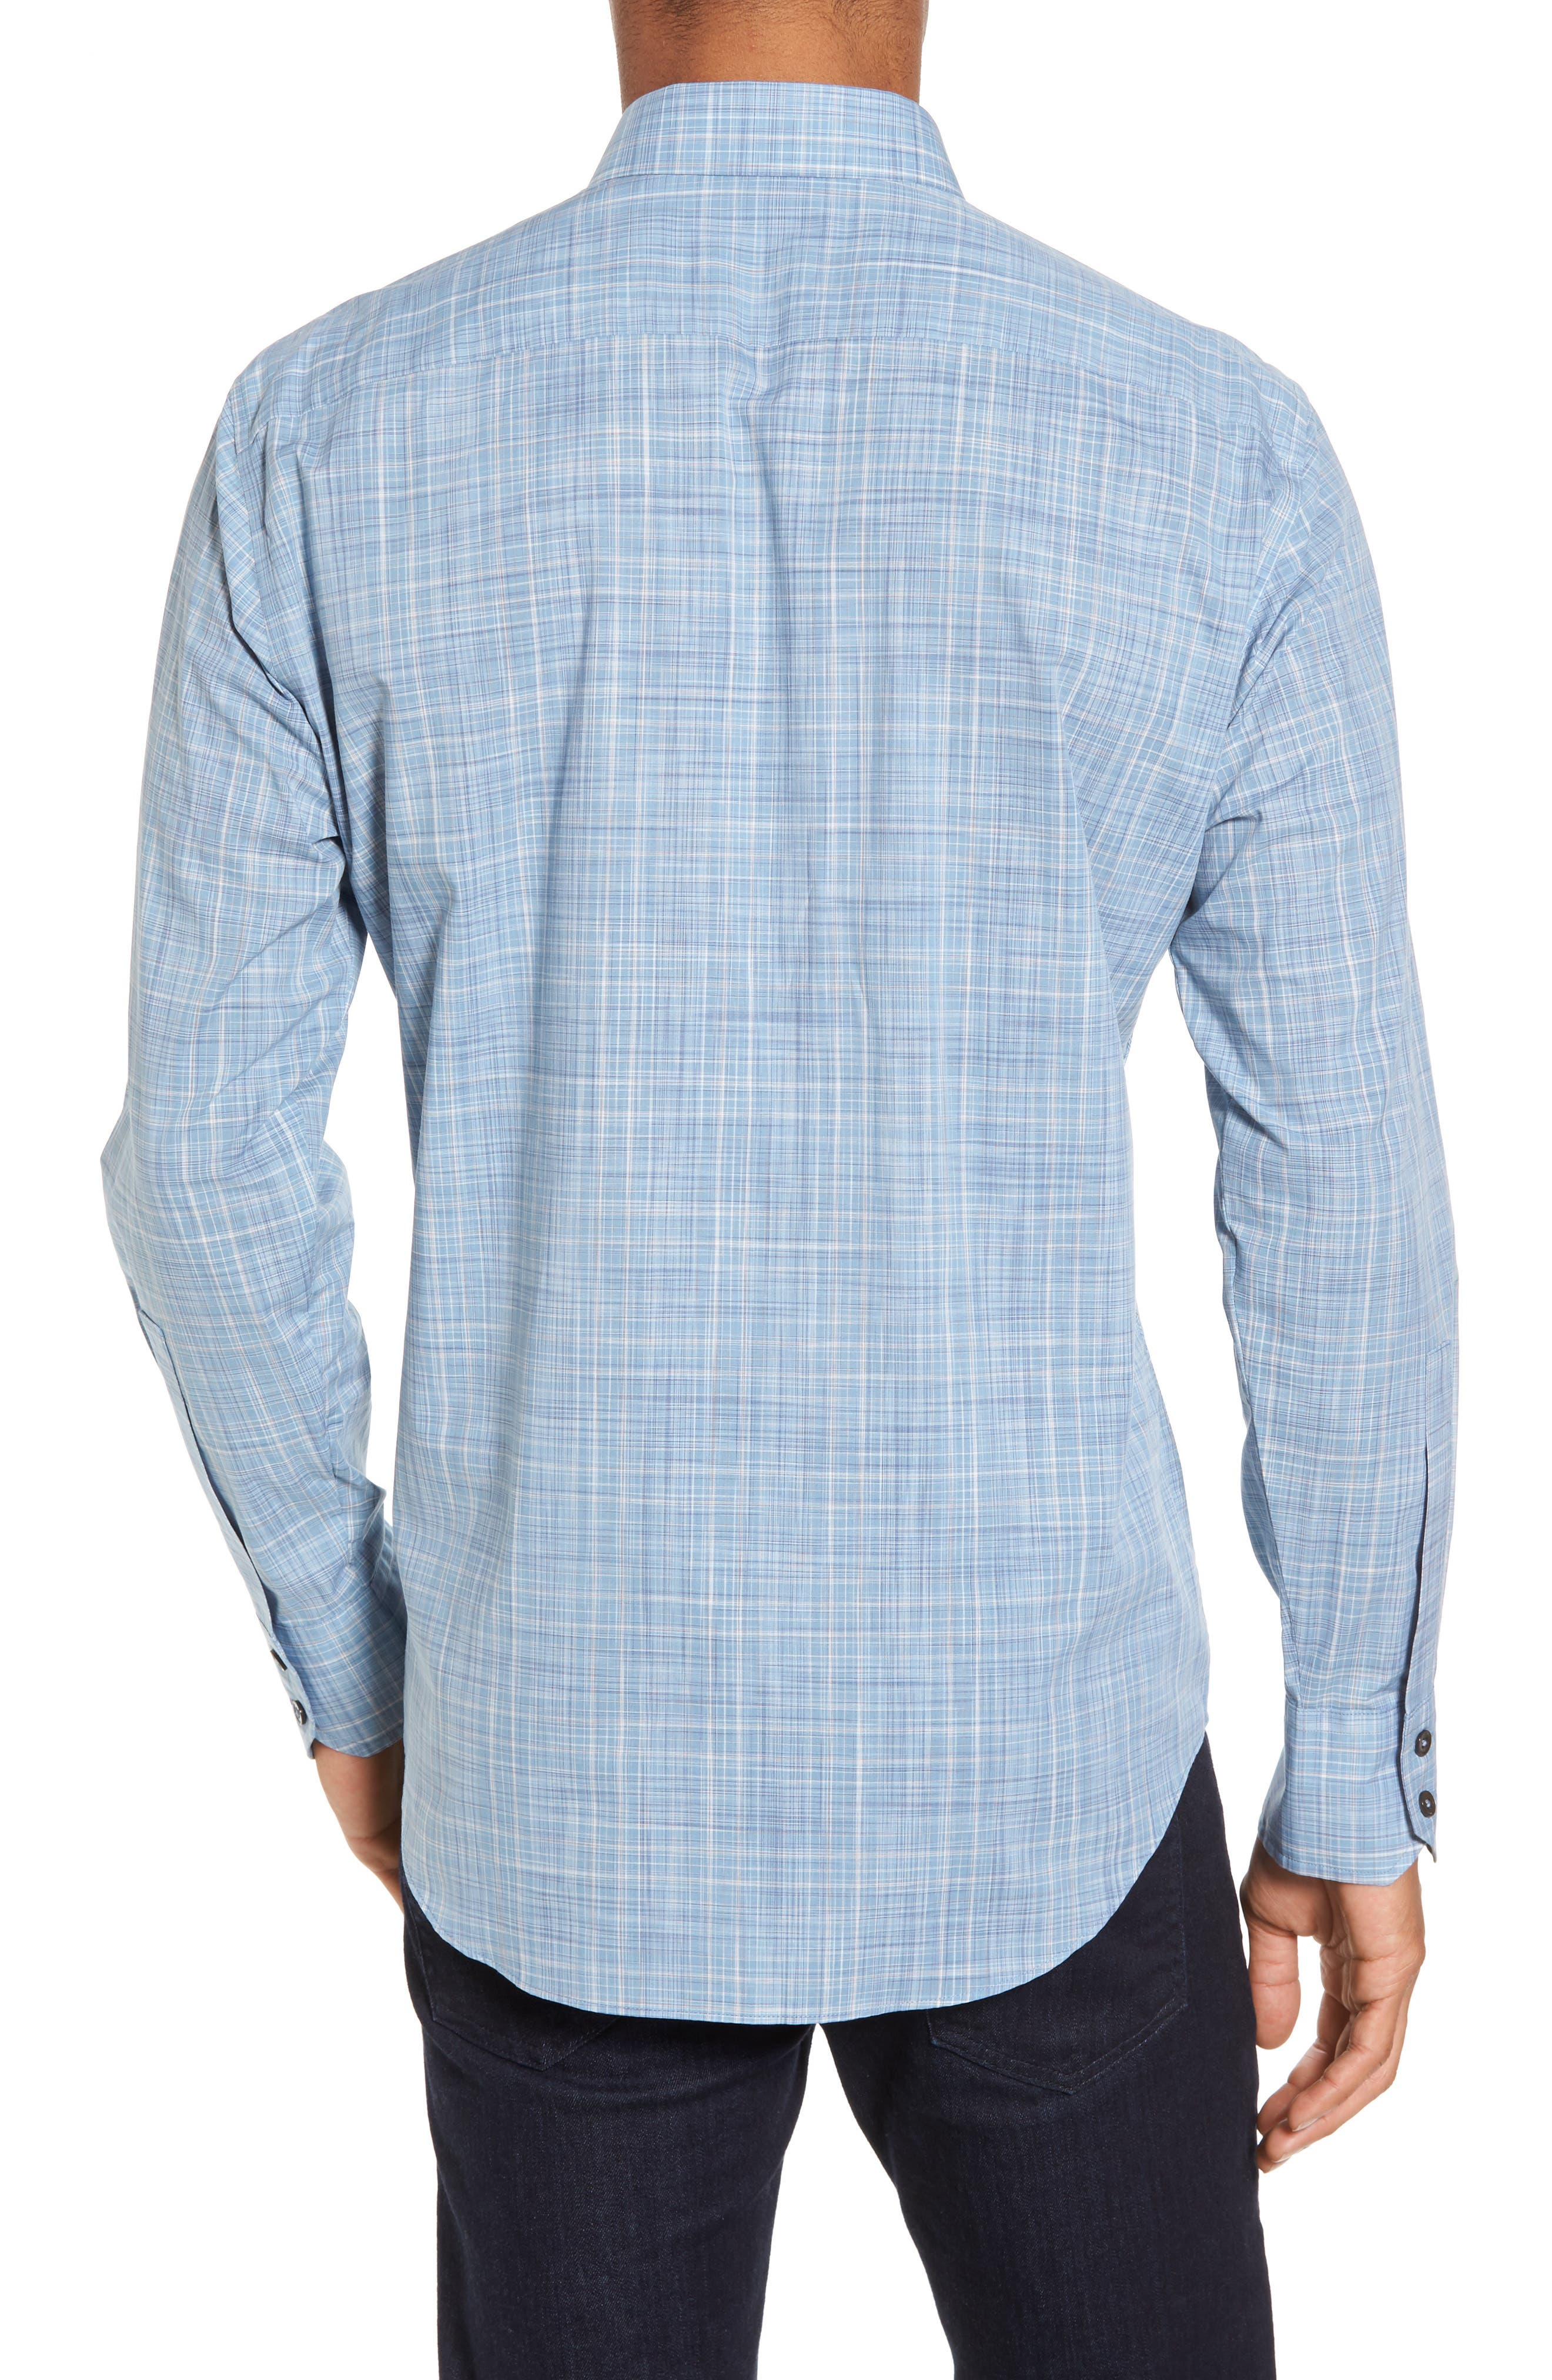 Alternate Image 2  - Zachary Prell Clark Slim Fit Plaid Sport Shirt